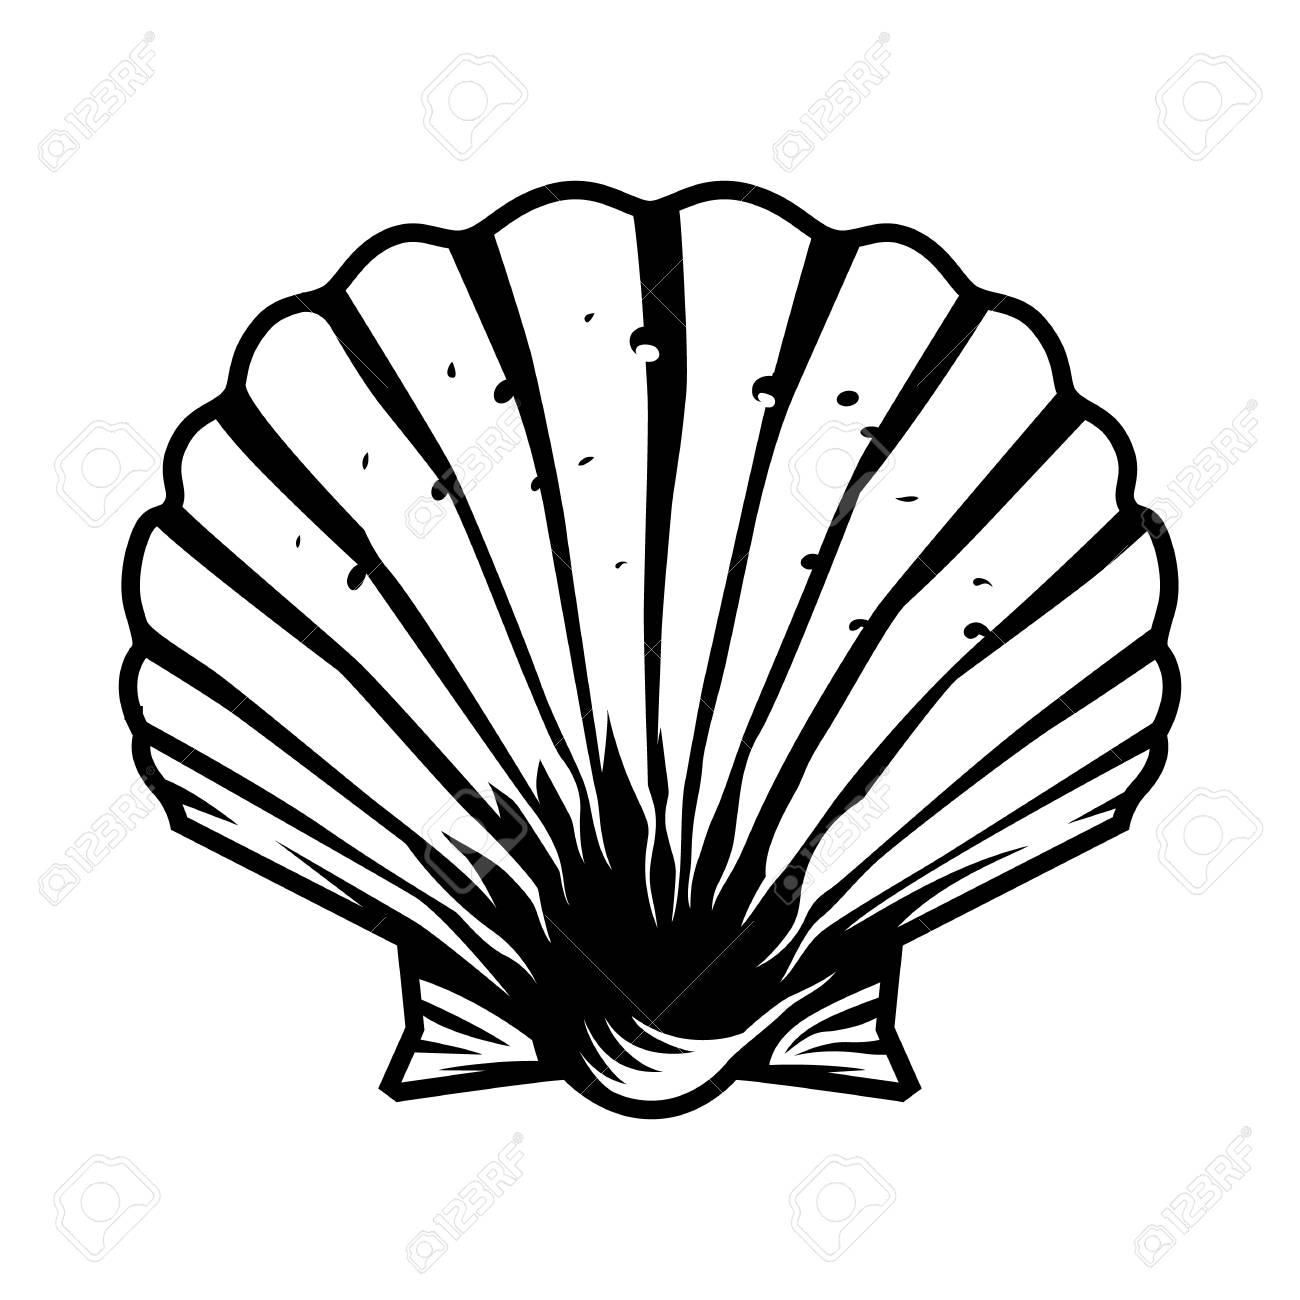 Vintage monochrome scallop seashell template isolated vector illustration - 109849248